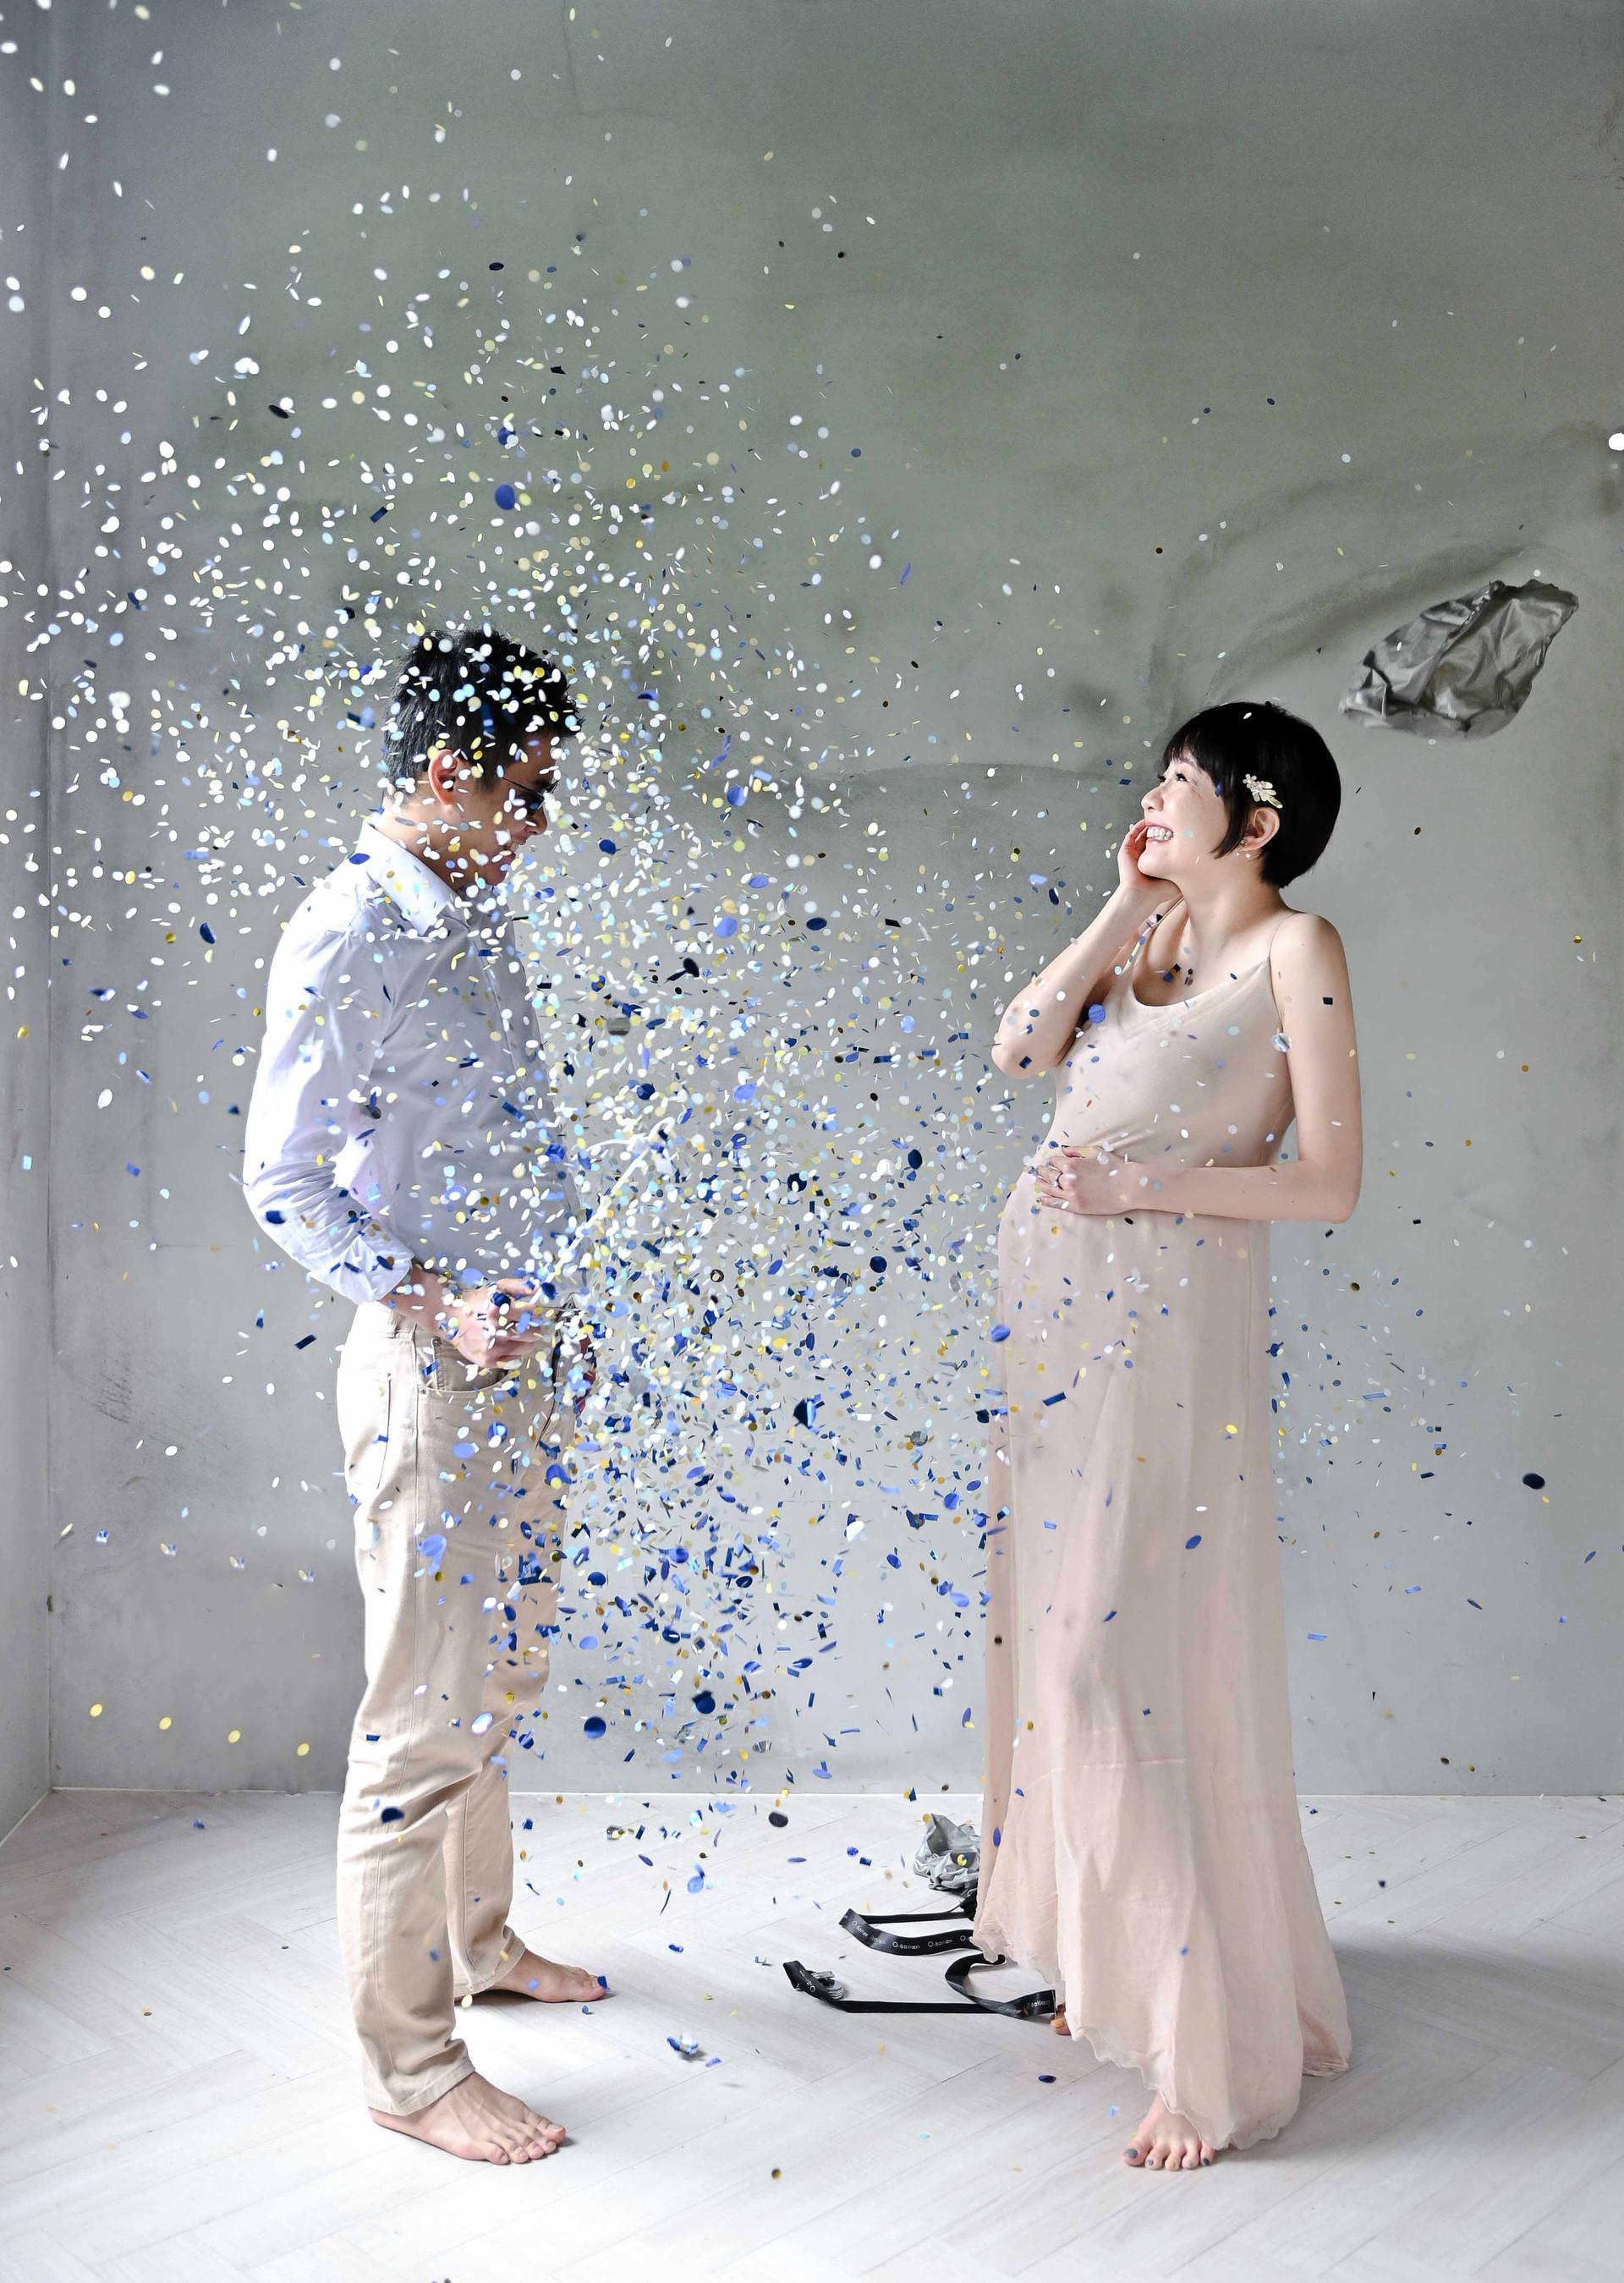 Sigrid Chien Photography琪琪小姐與喬先生 浿機孕婦寫真